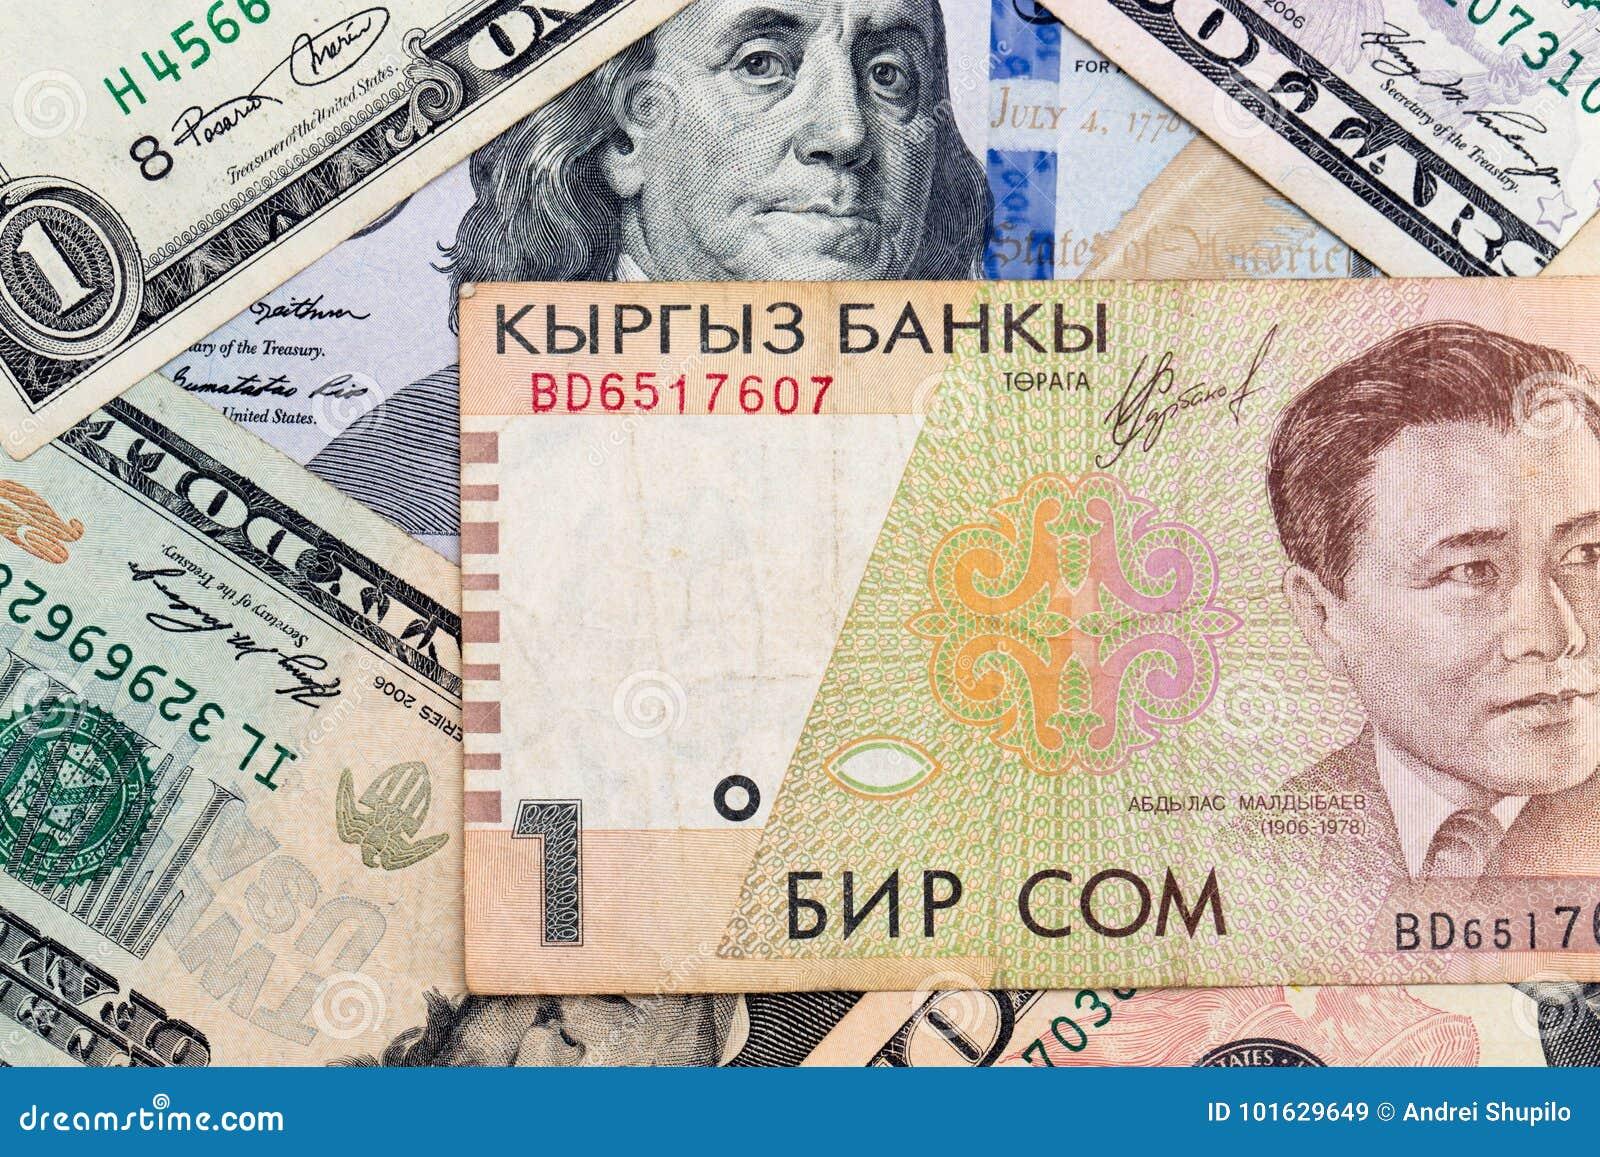 American dollars and Kyrgyz money